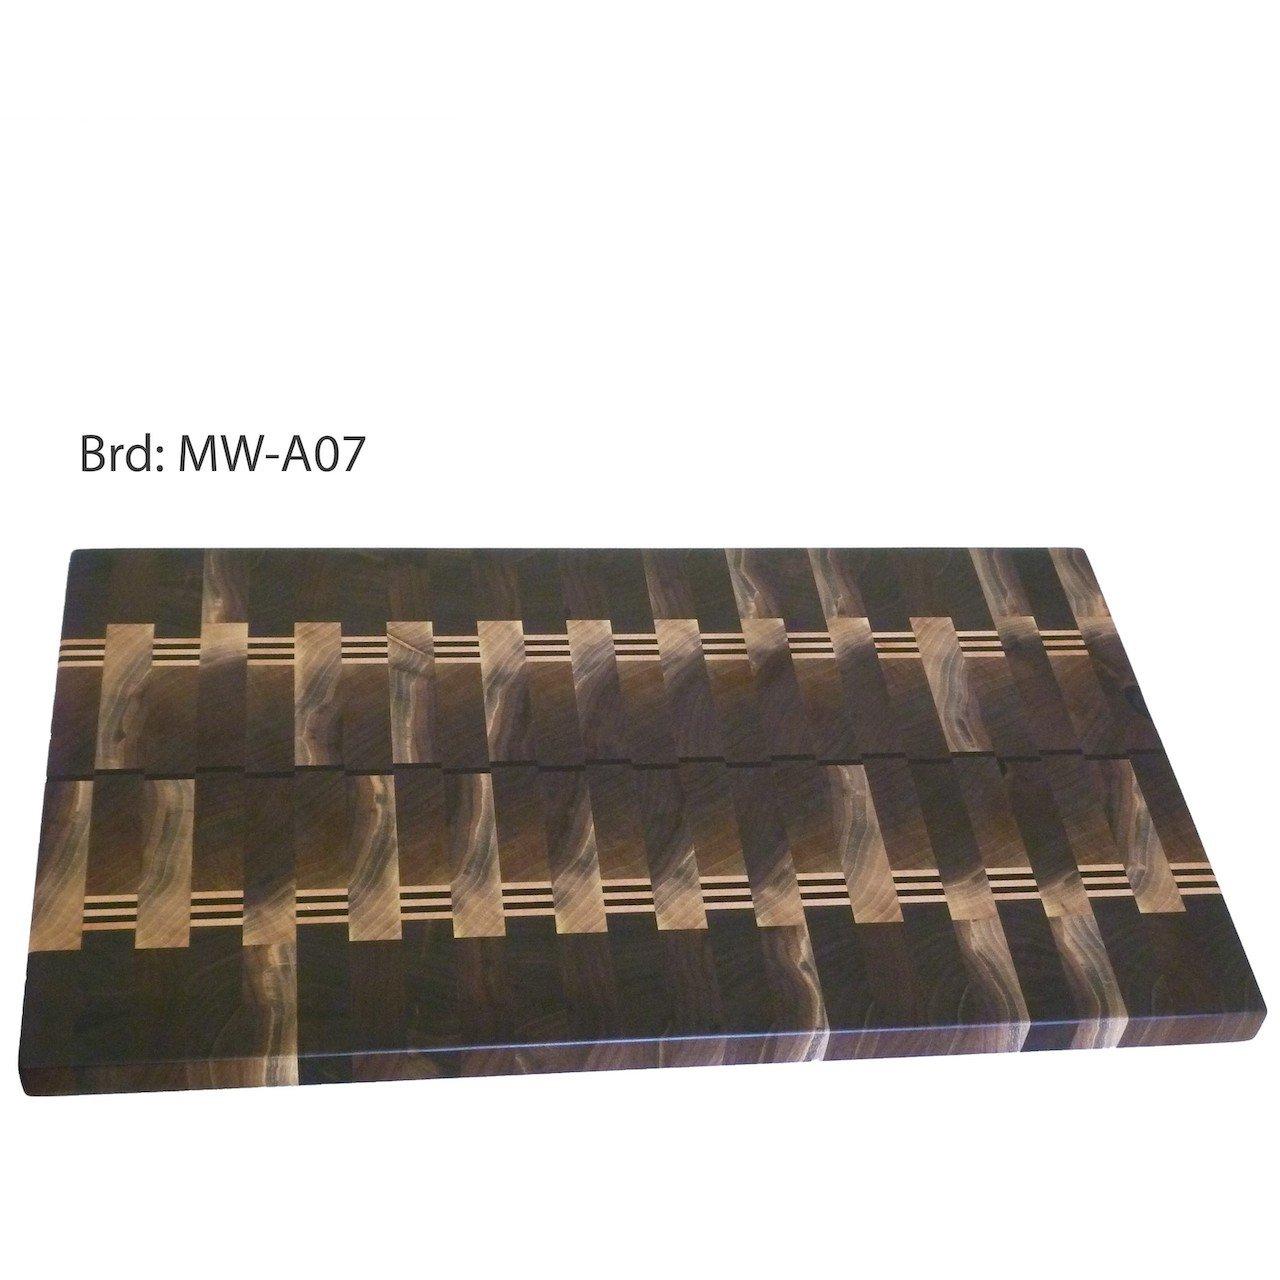 MW-A07